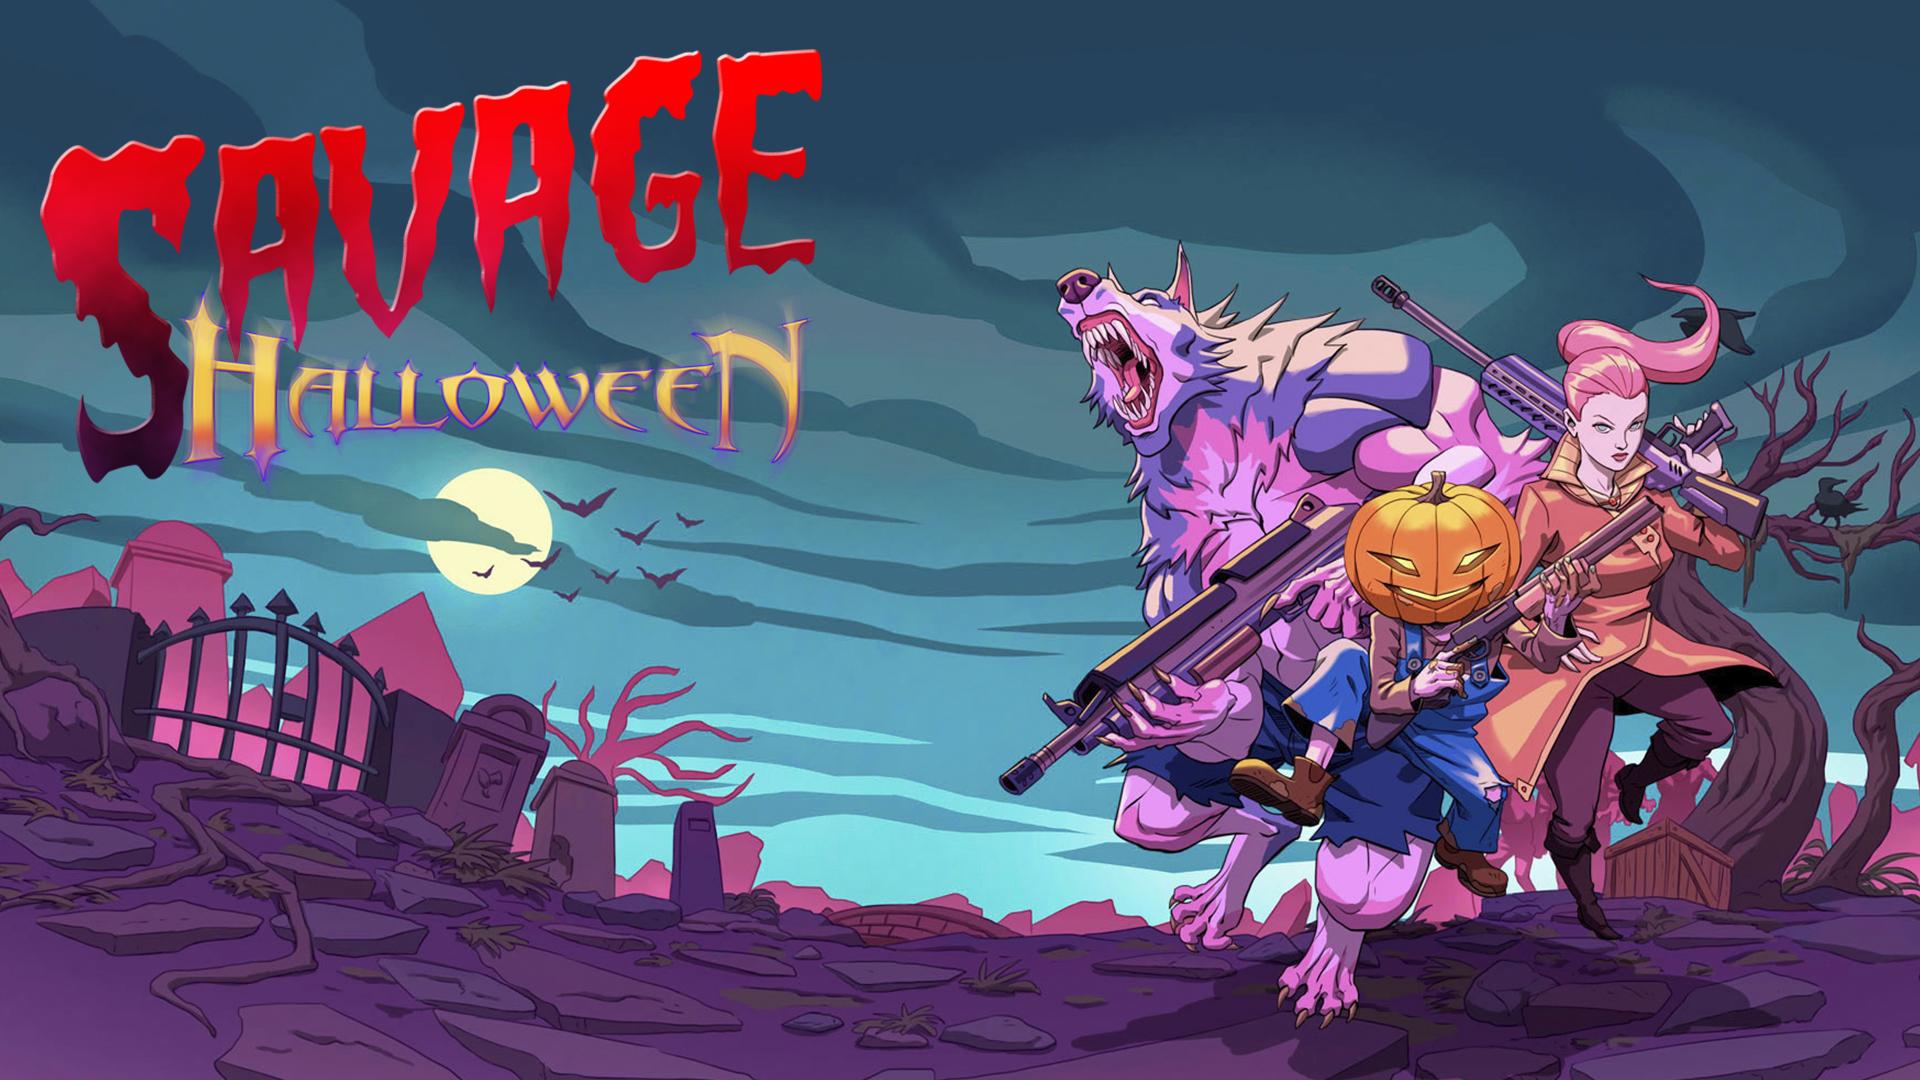 Savage Halloween (Nintendo Switch) £2.24 at Nintendo eShop